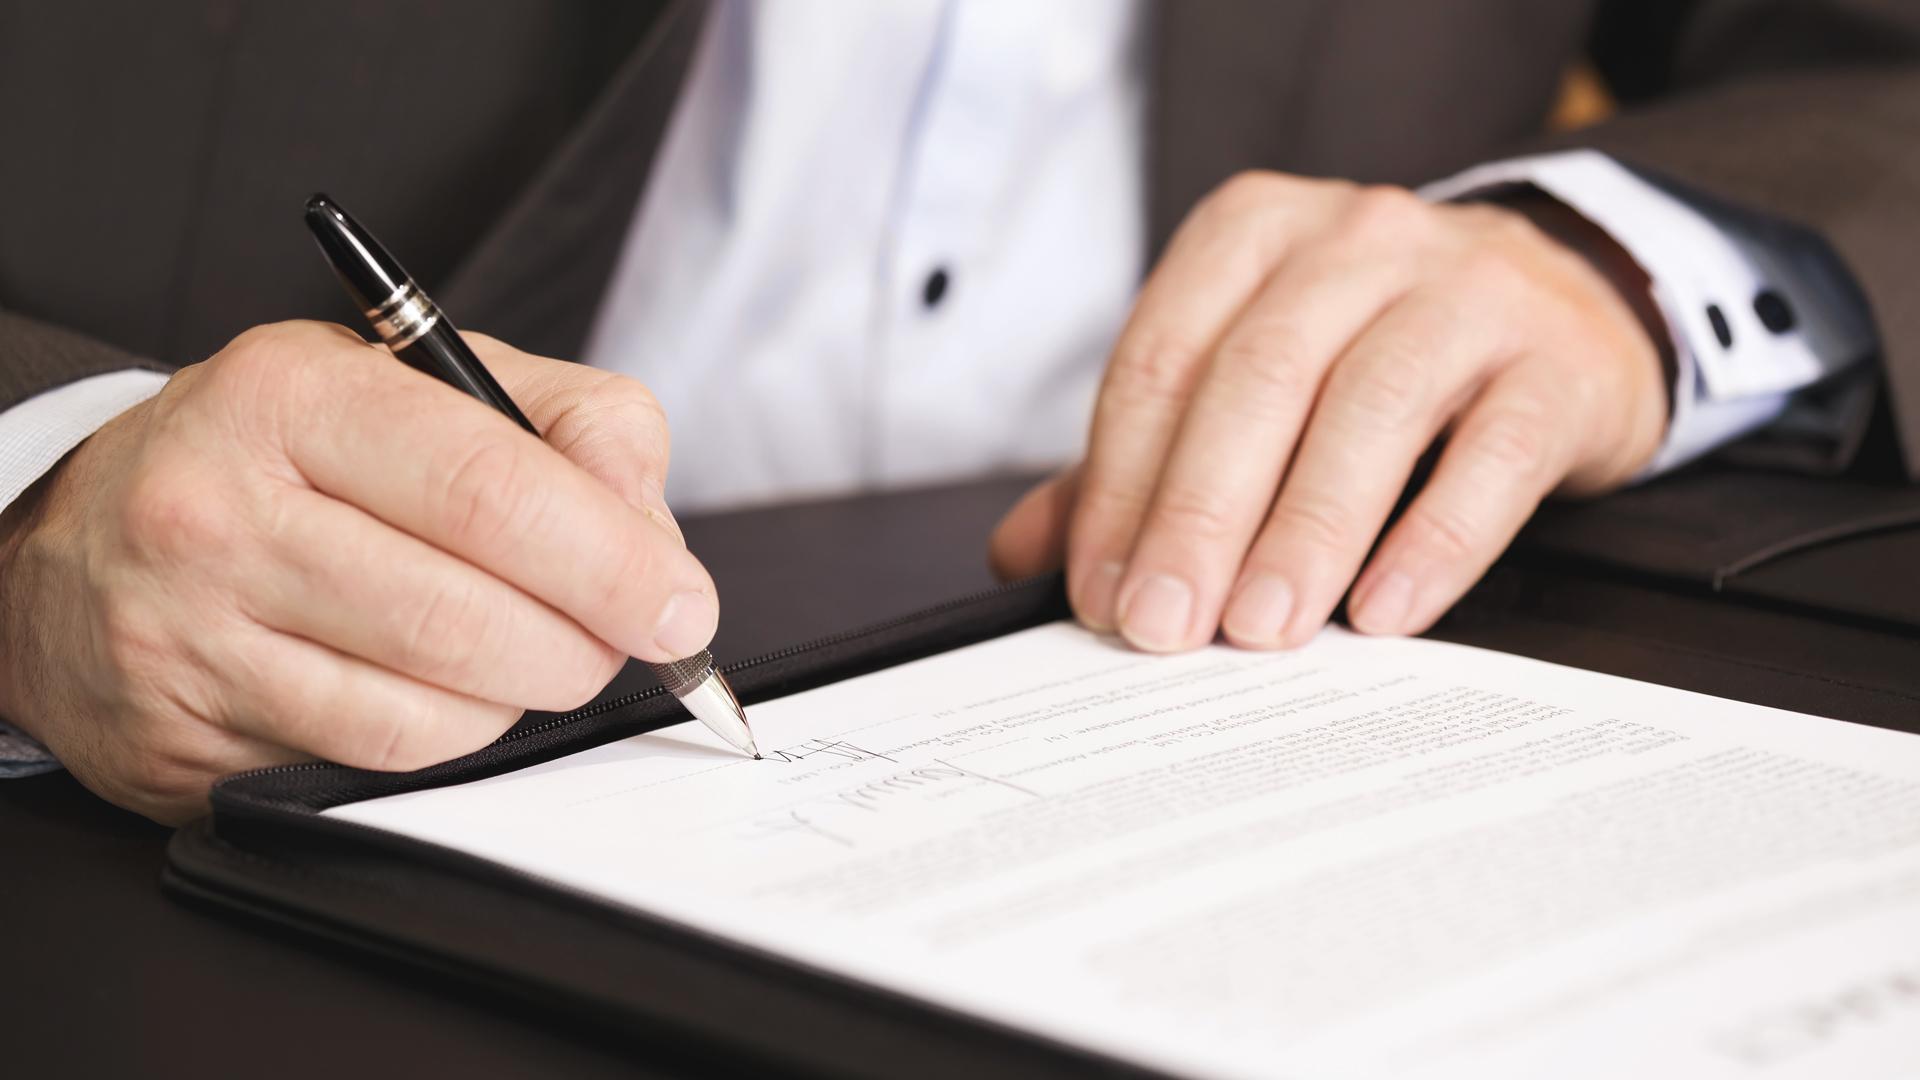 [VÍDEO] Saiba tudo sobre os aspectos jurídicos fundamentais das franquias